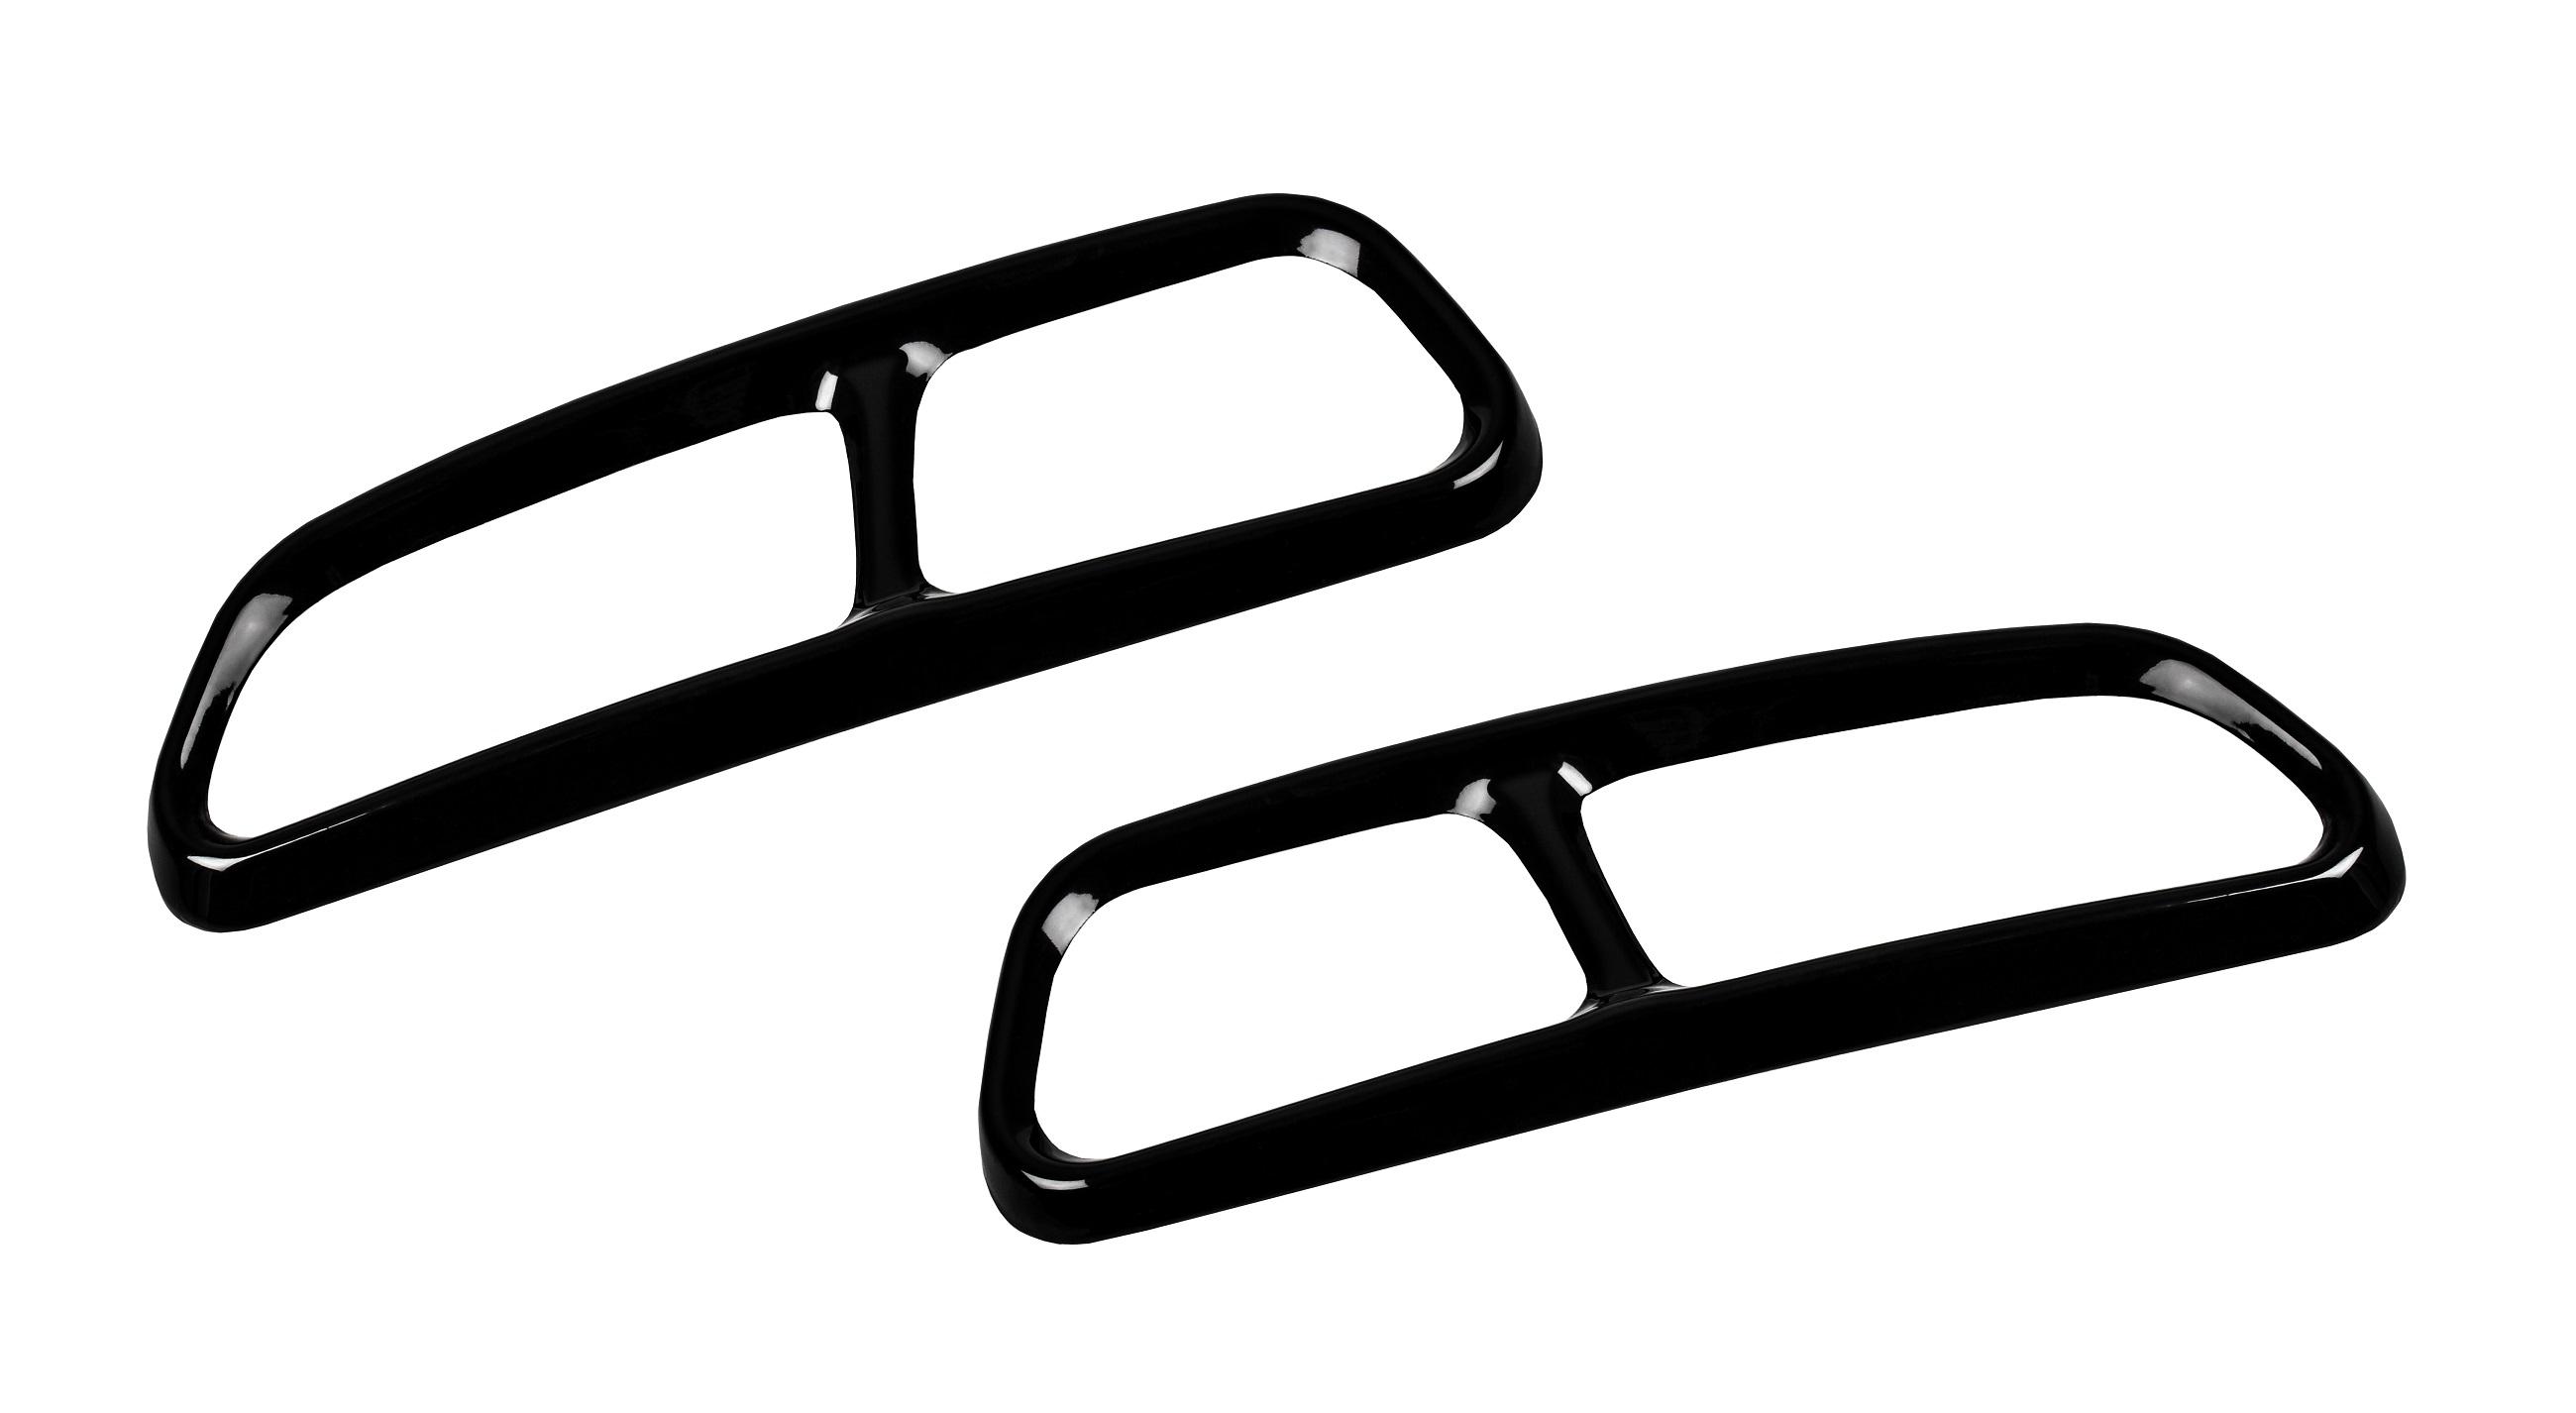 AUTOLIGHT 24 2 x Black Chrome Auspuffblenden Edelstahl Abdeckung Auspuff f/ür A6 C7 A7